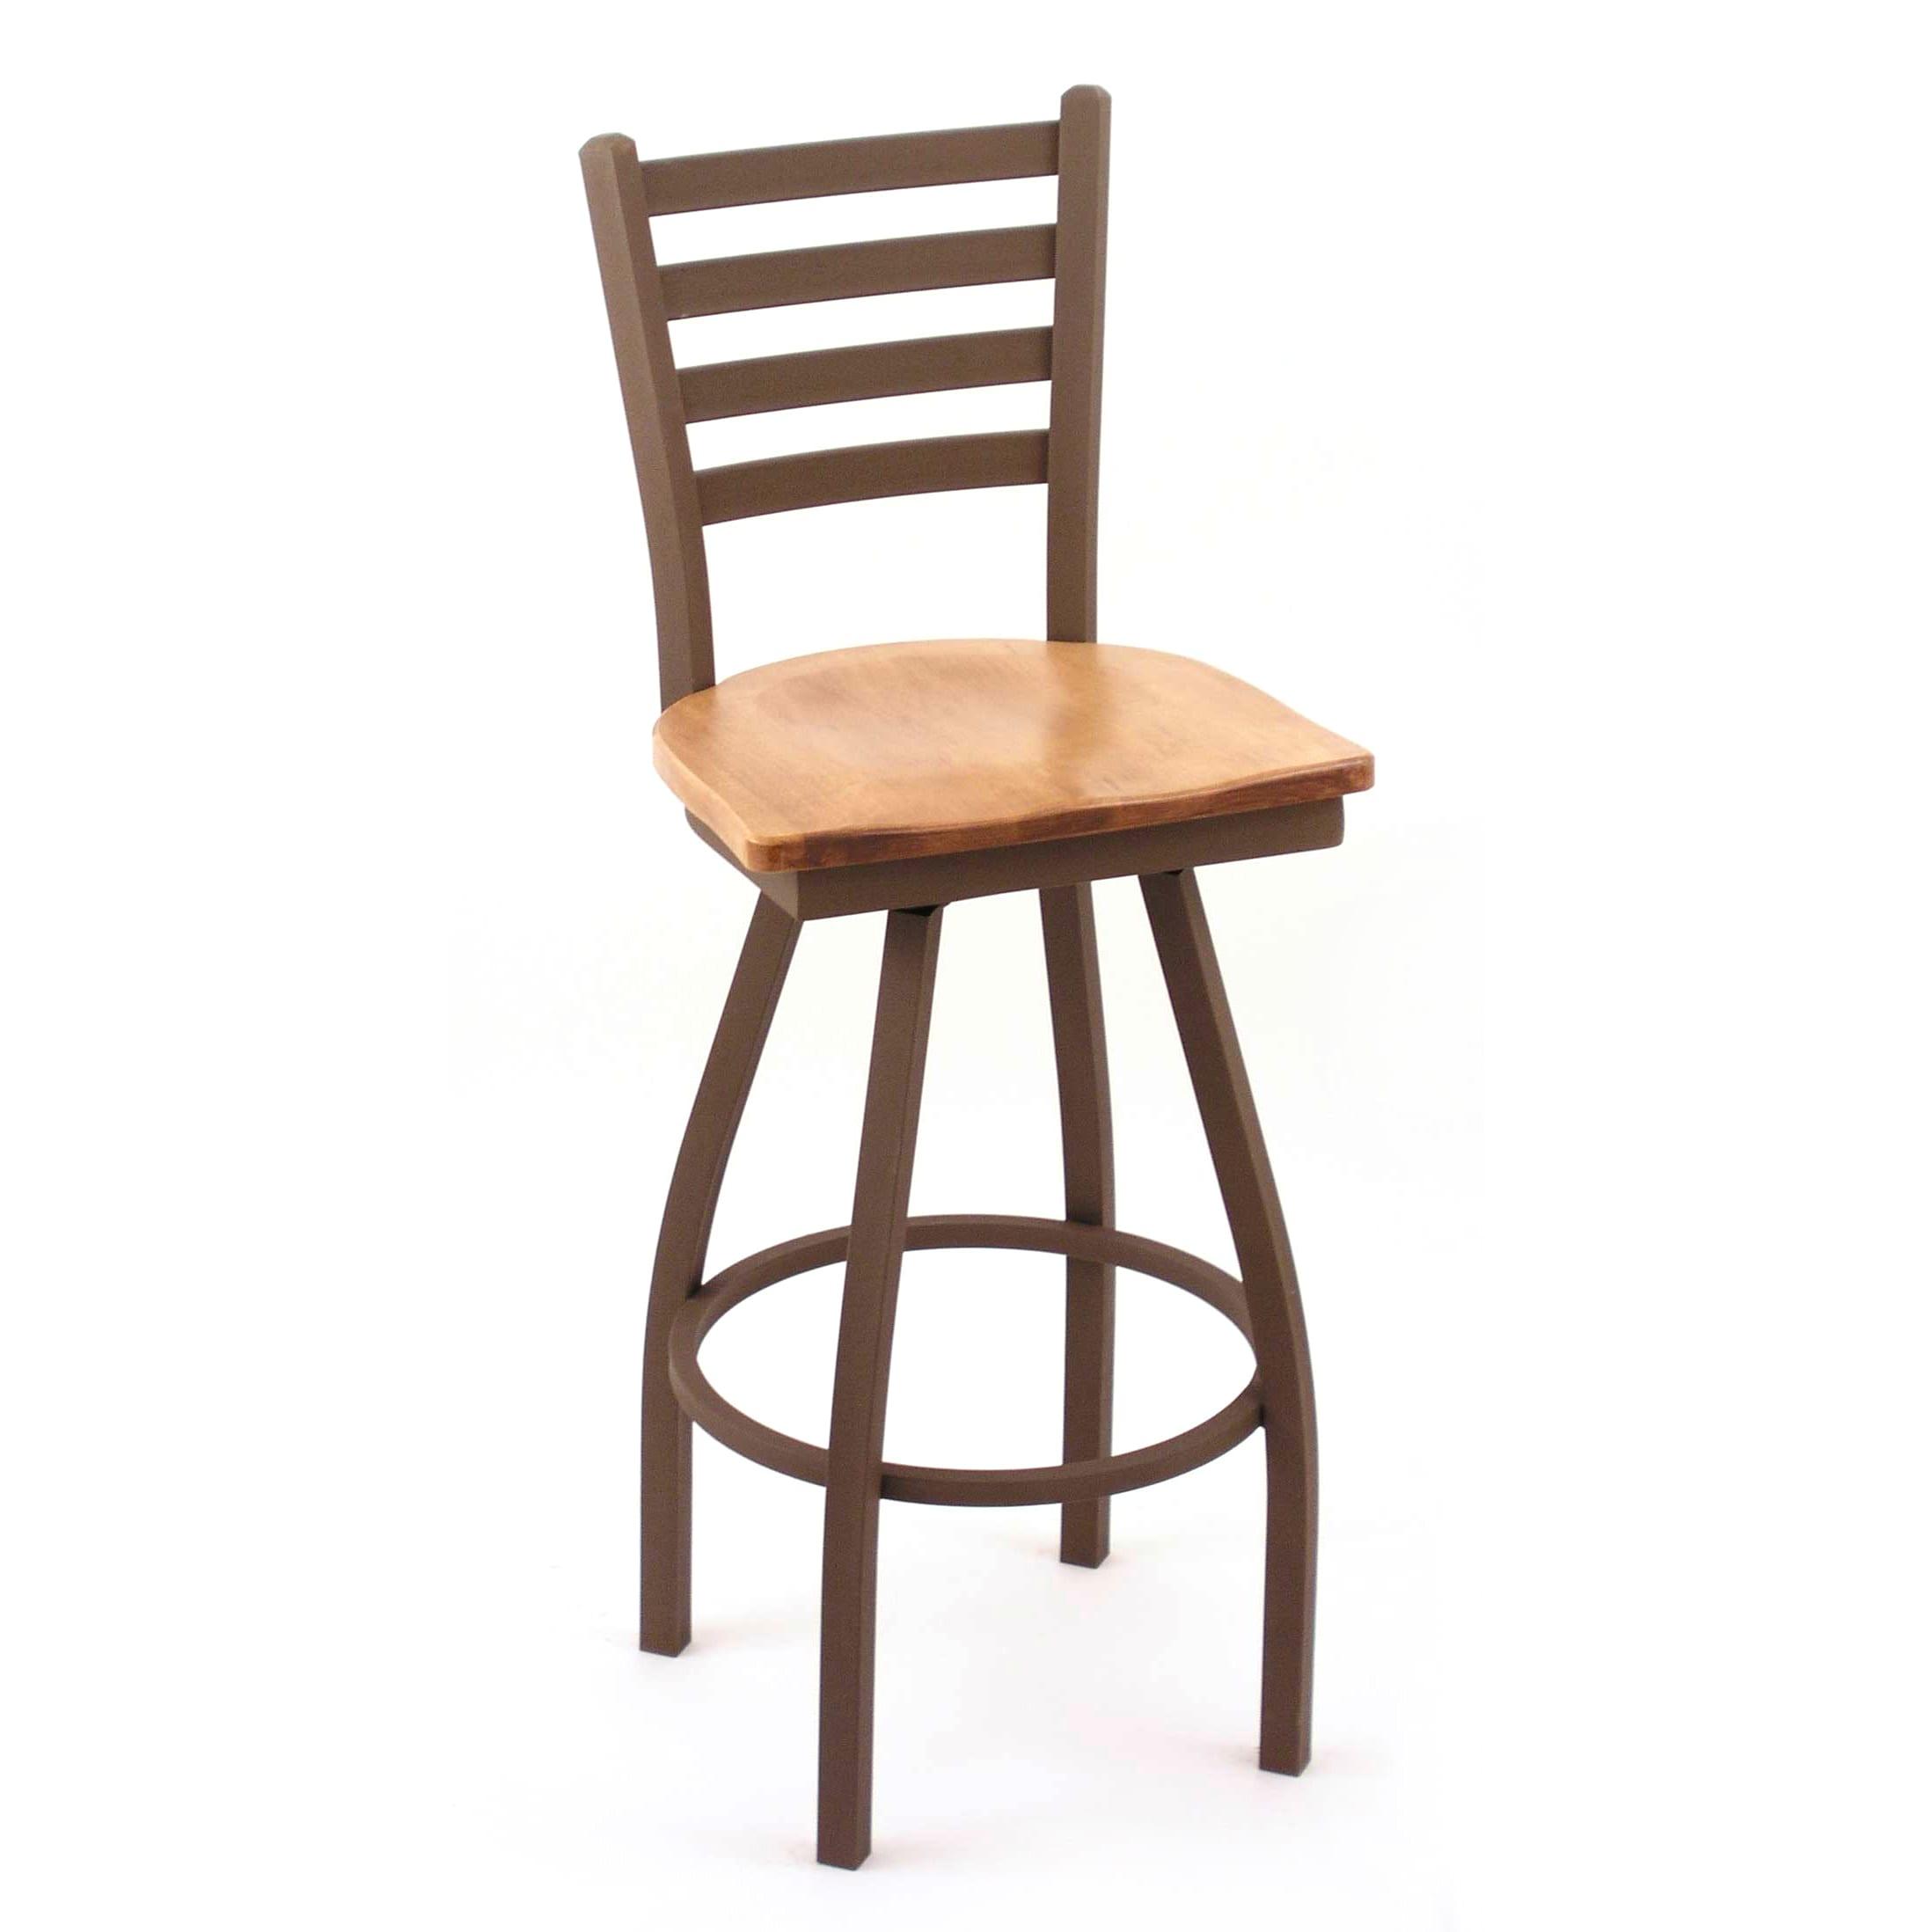 Shop cambridge 36 inch maple horizontal slat back bar stool free shipping today overstock com 7650038